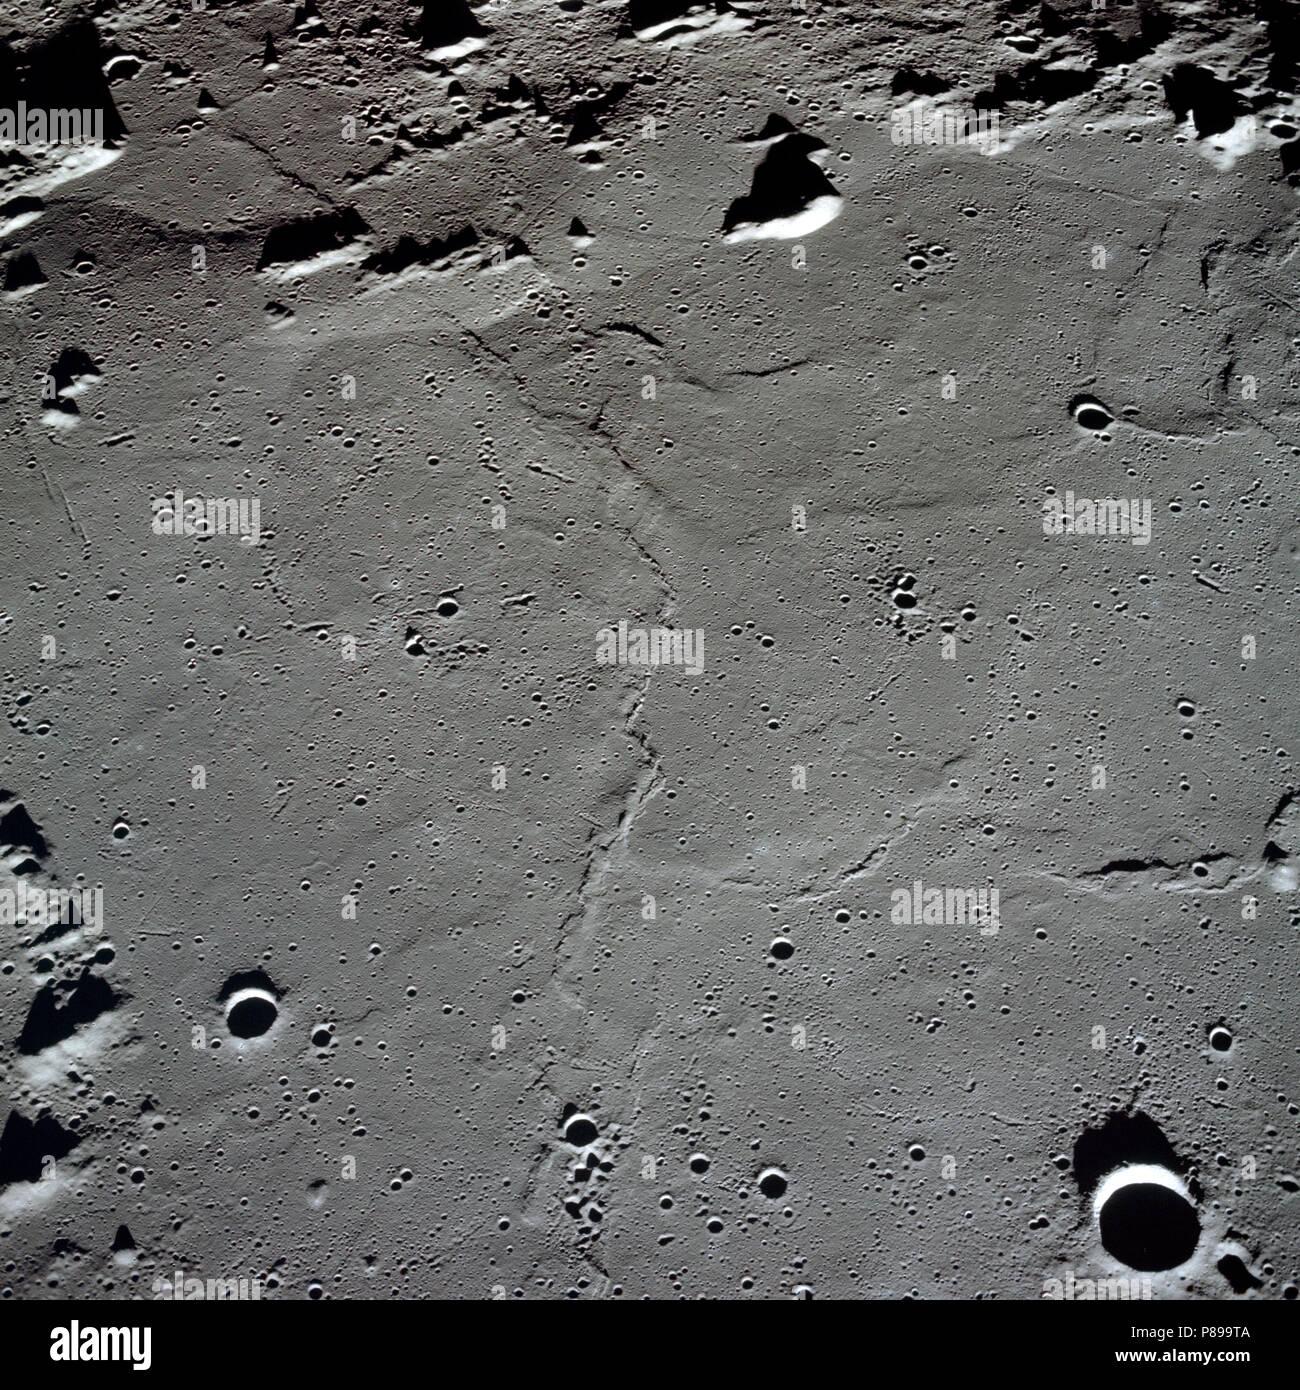 Apollo 10 photo of the lunar nearside looking westward across Apollo Landing Site 3 in Central Bay. - Stock Image